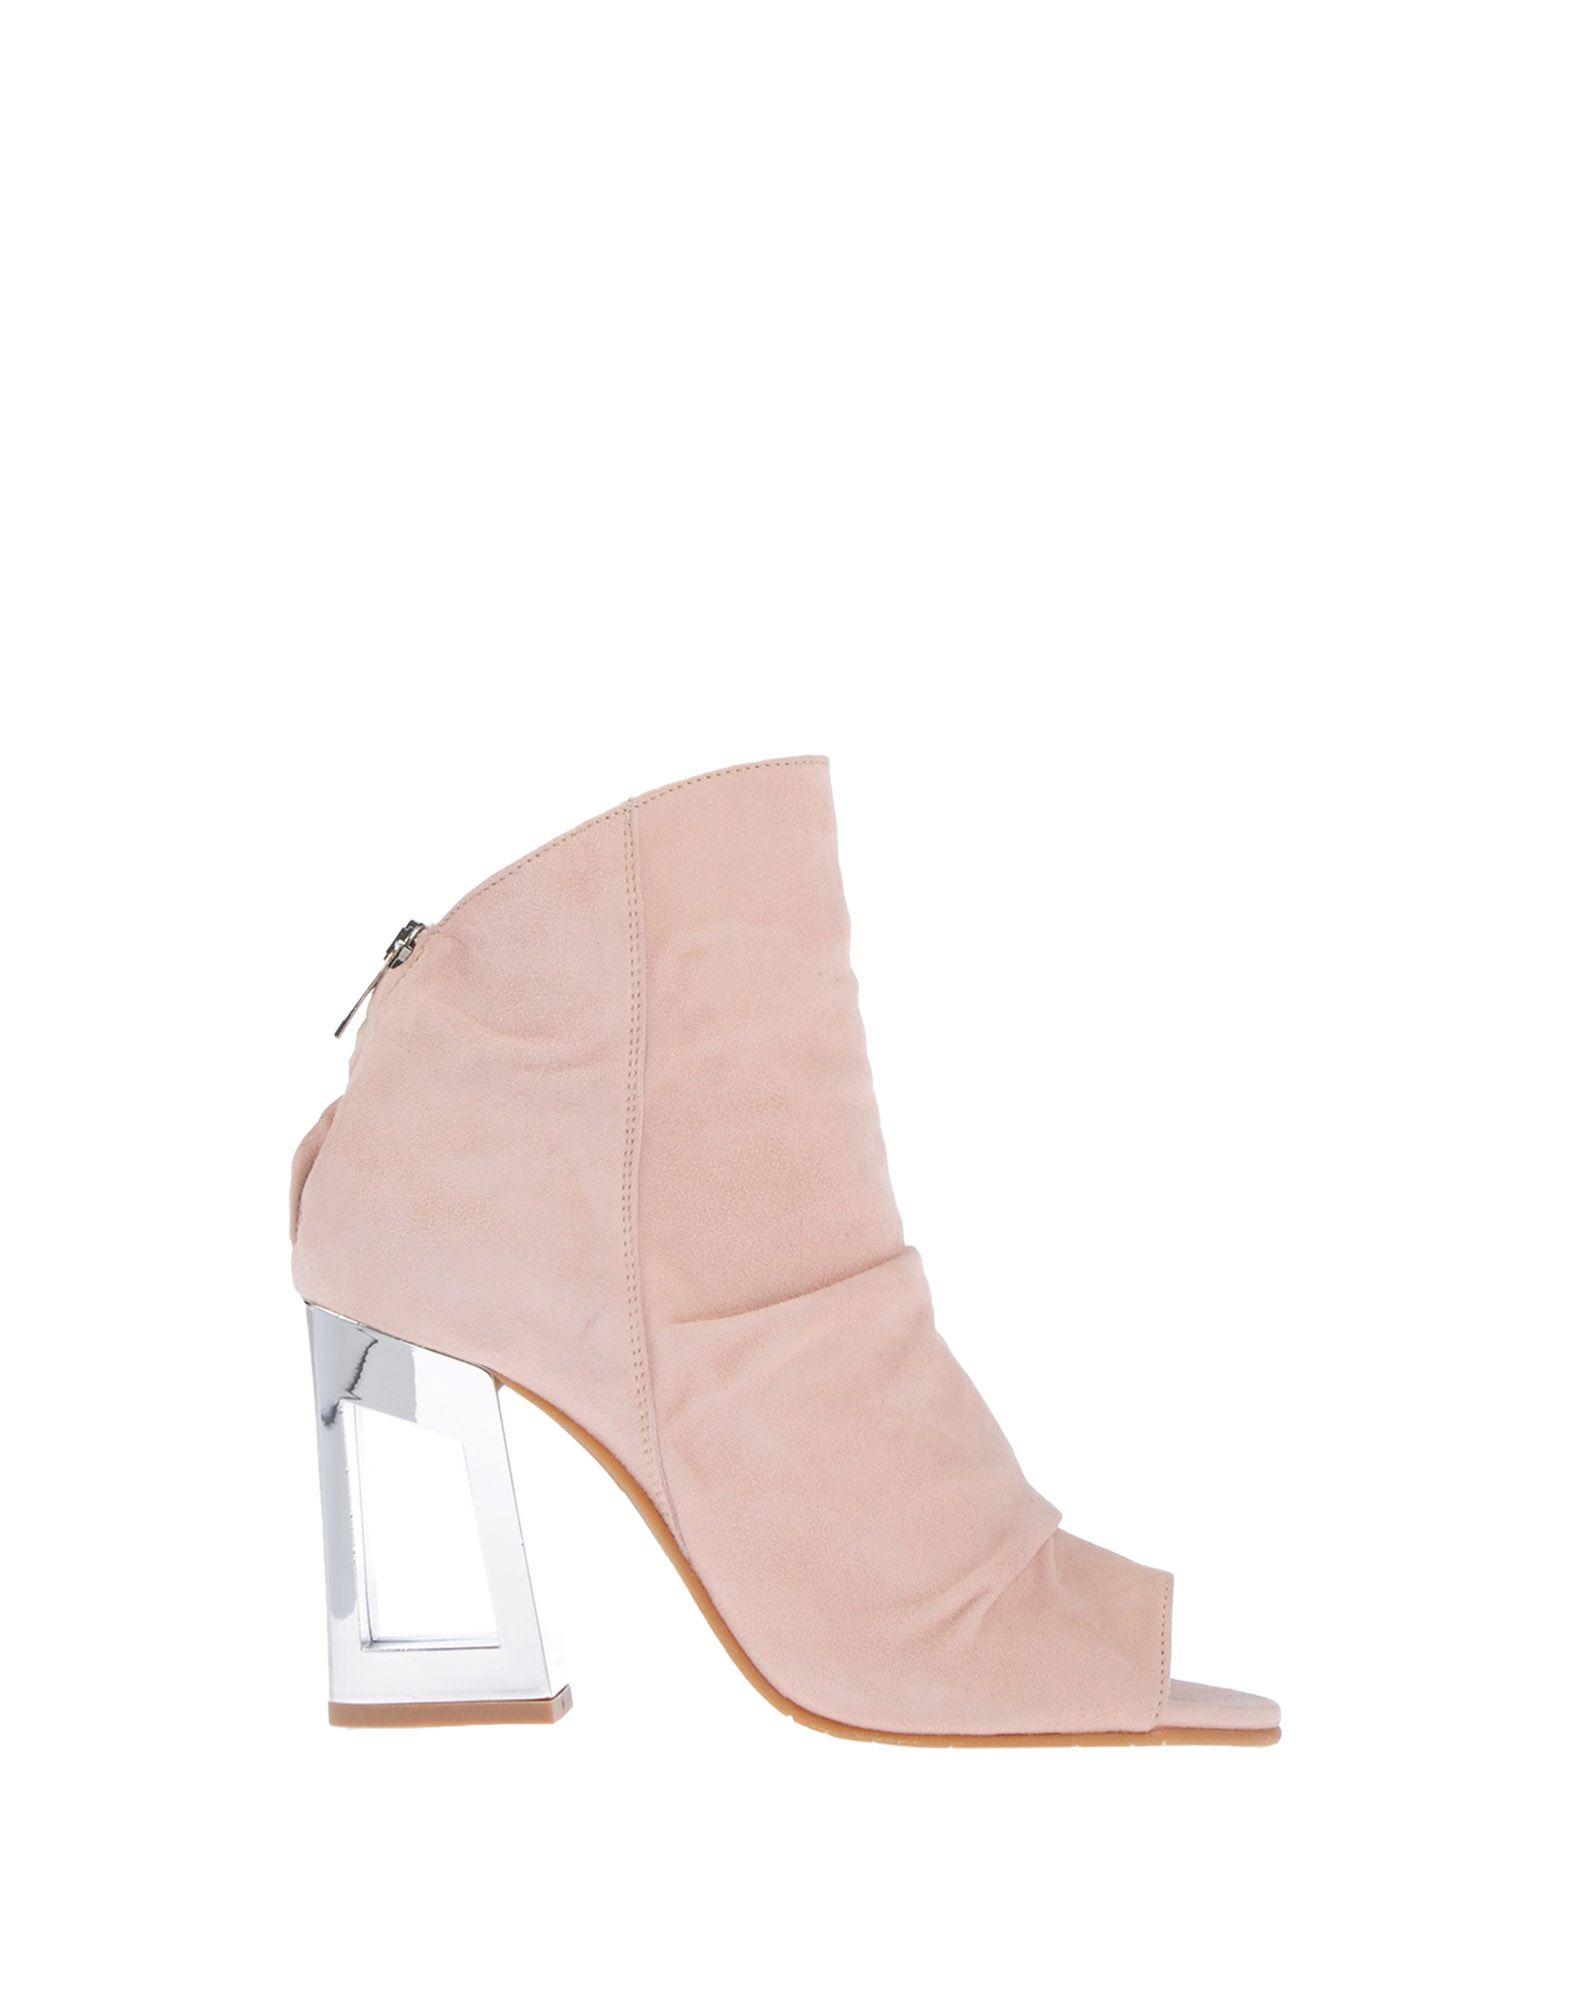 Elah Ela Romei Stiefelette Damen  11428624TH Gute Qualität beliebte Schuhe